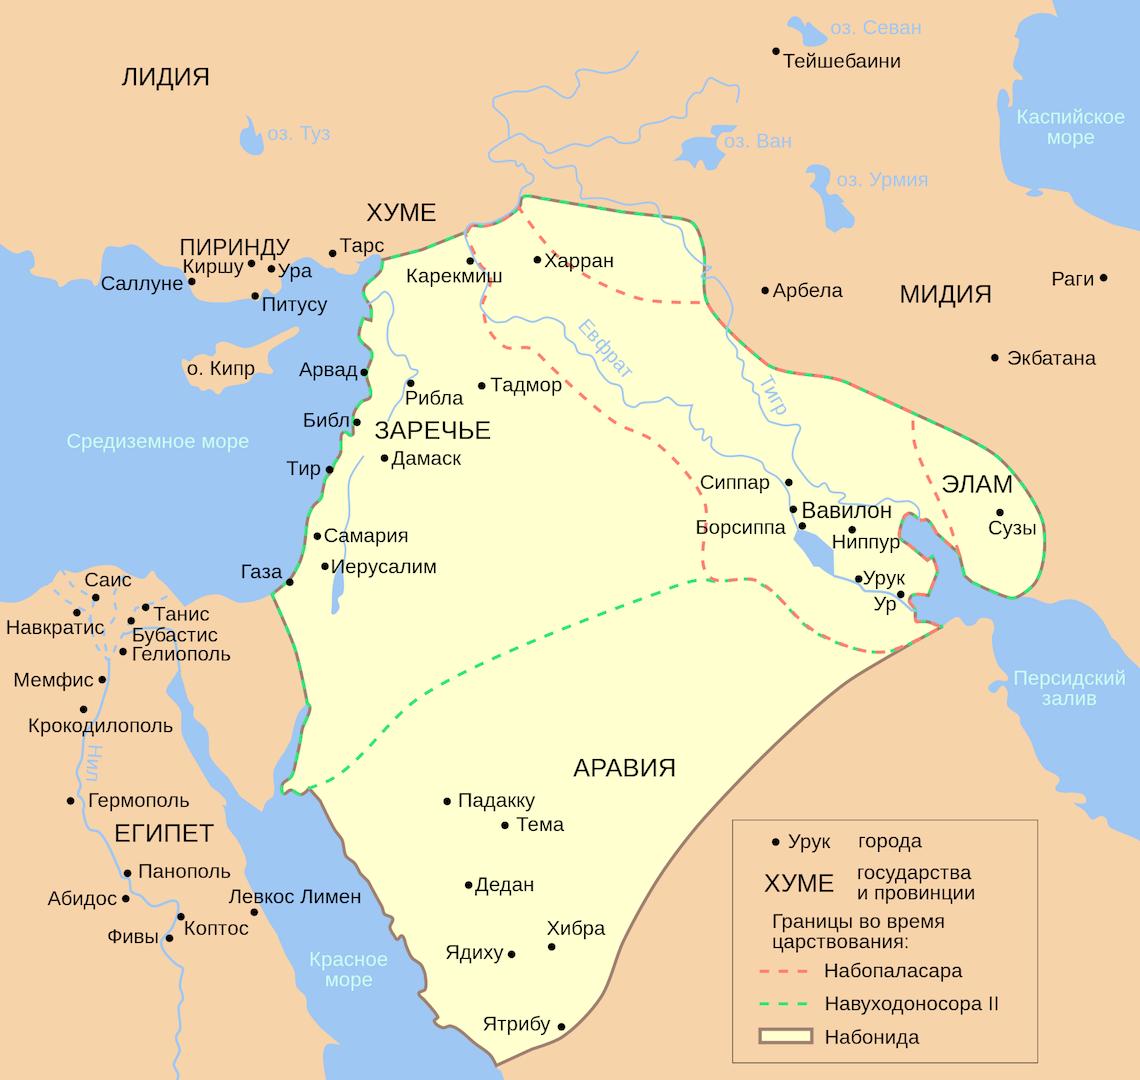 Вавилон где находится на карте